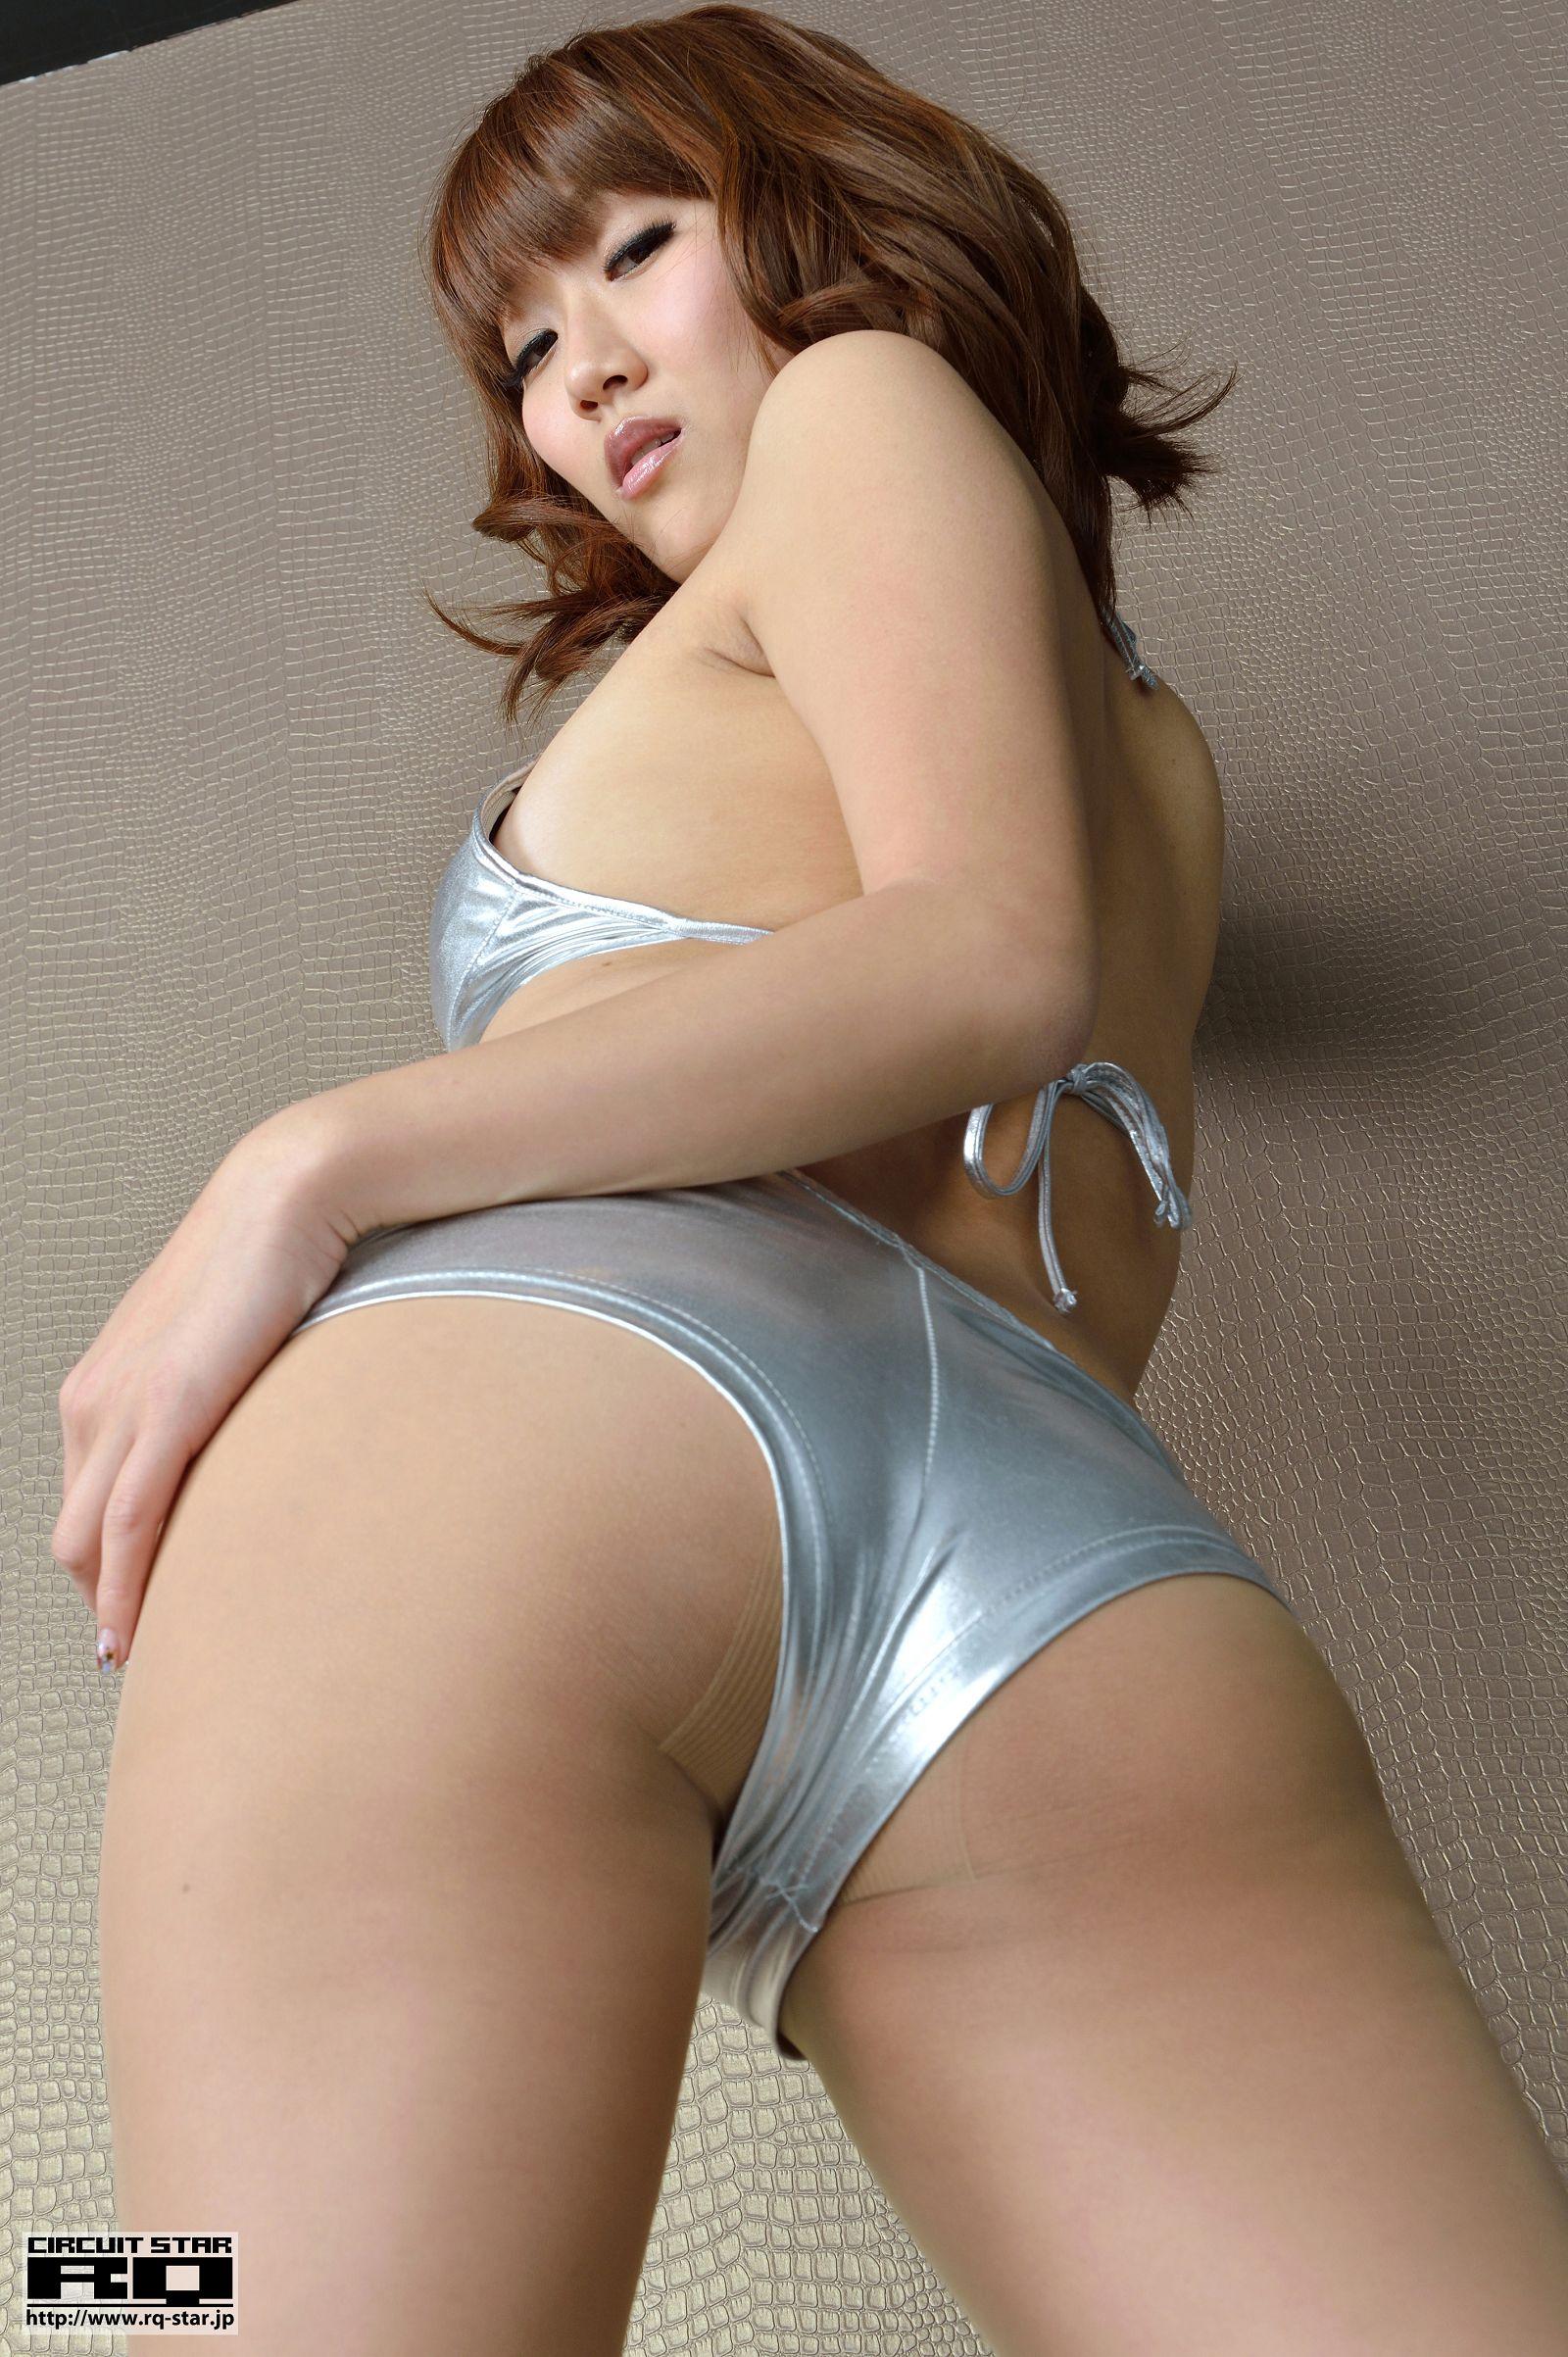 [RQ STAR美女] NO.00767 Yuka Higuchi 樋口結花 Swim Suits[80P] RQ STAR 第3张